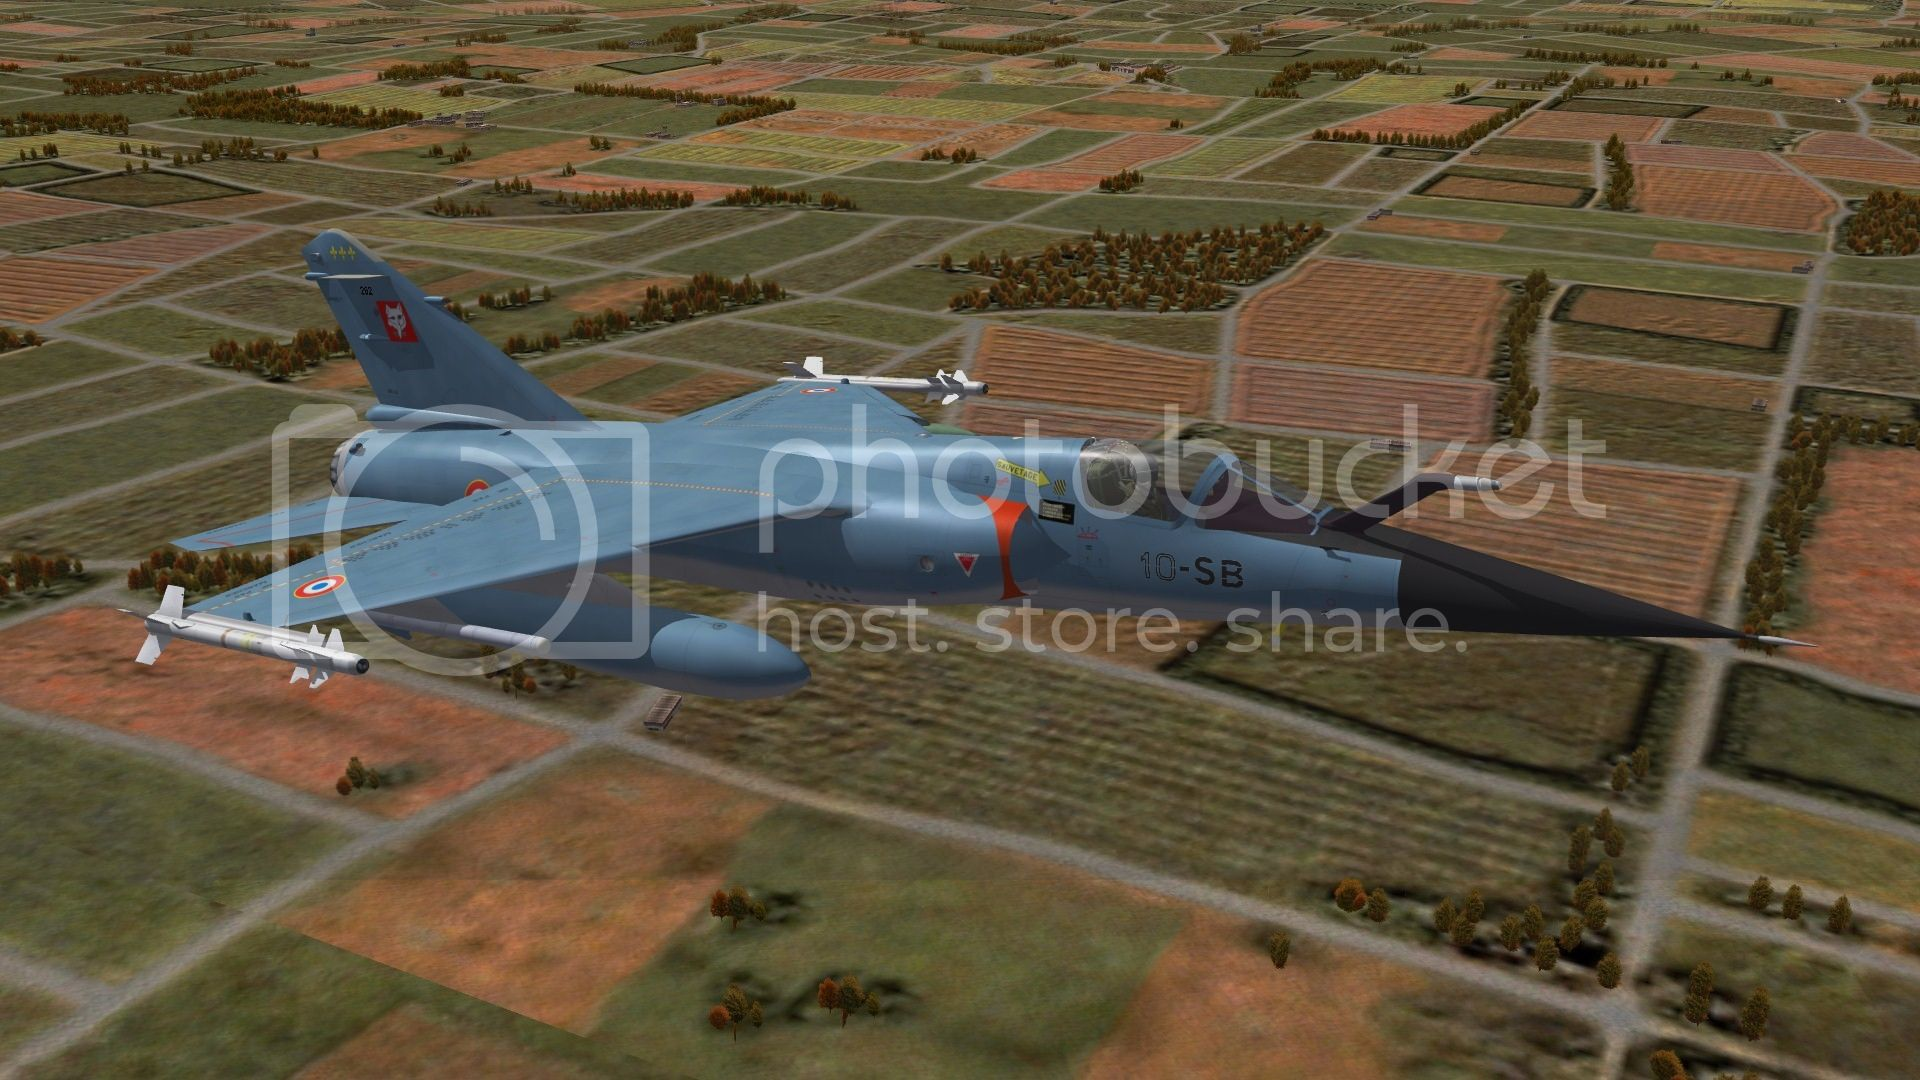 F-1C-1-10-001.jpg